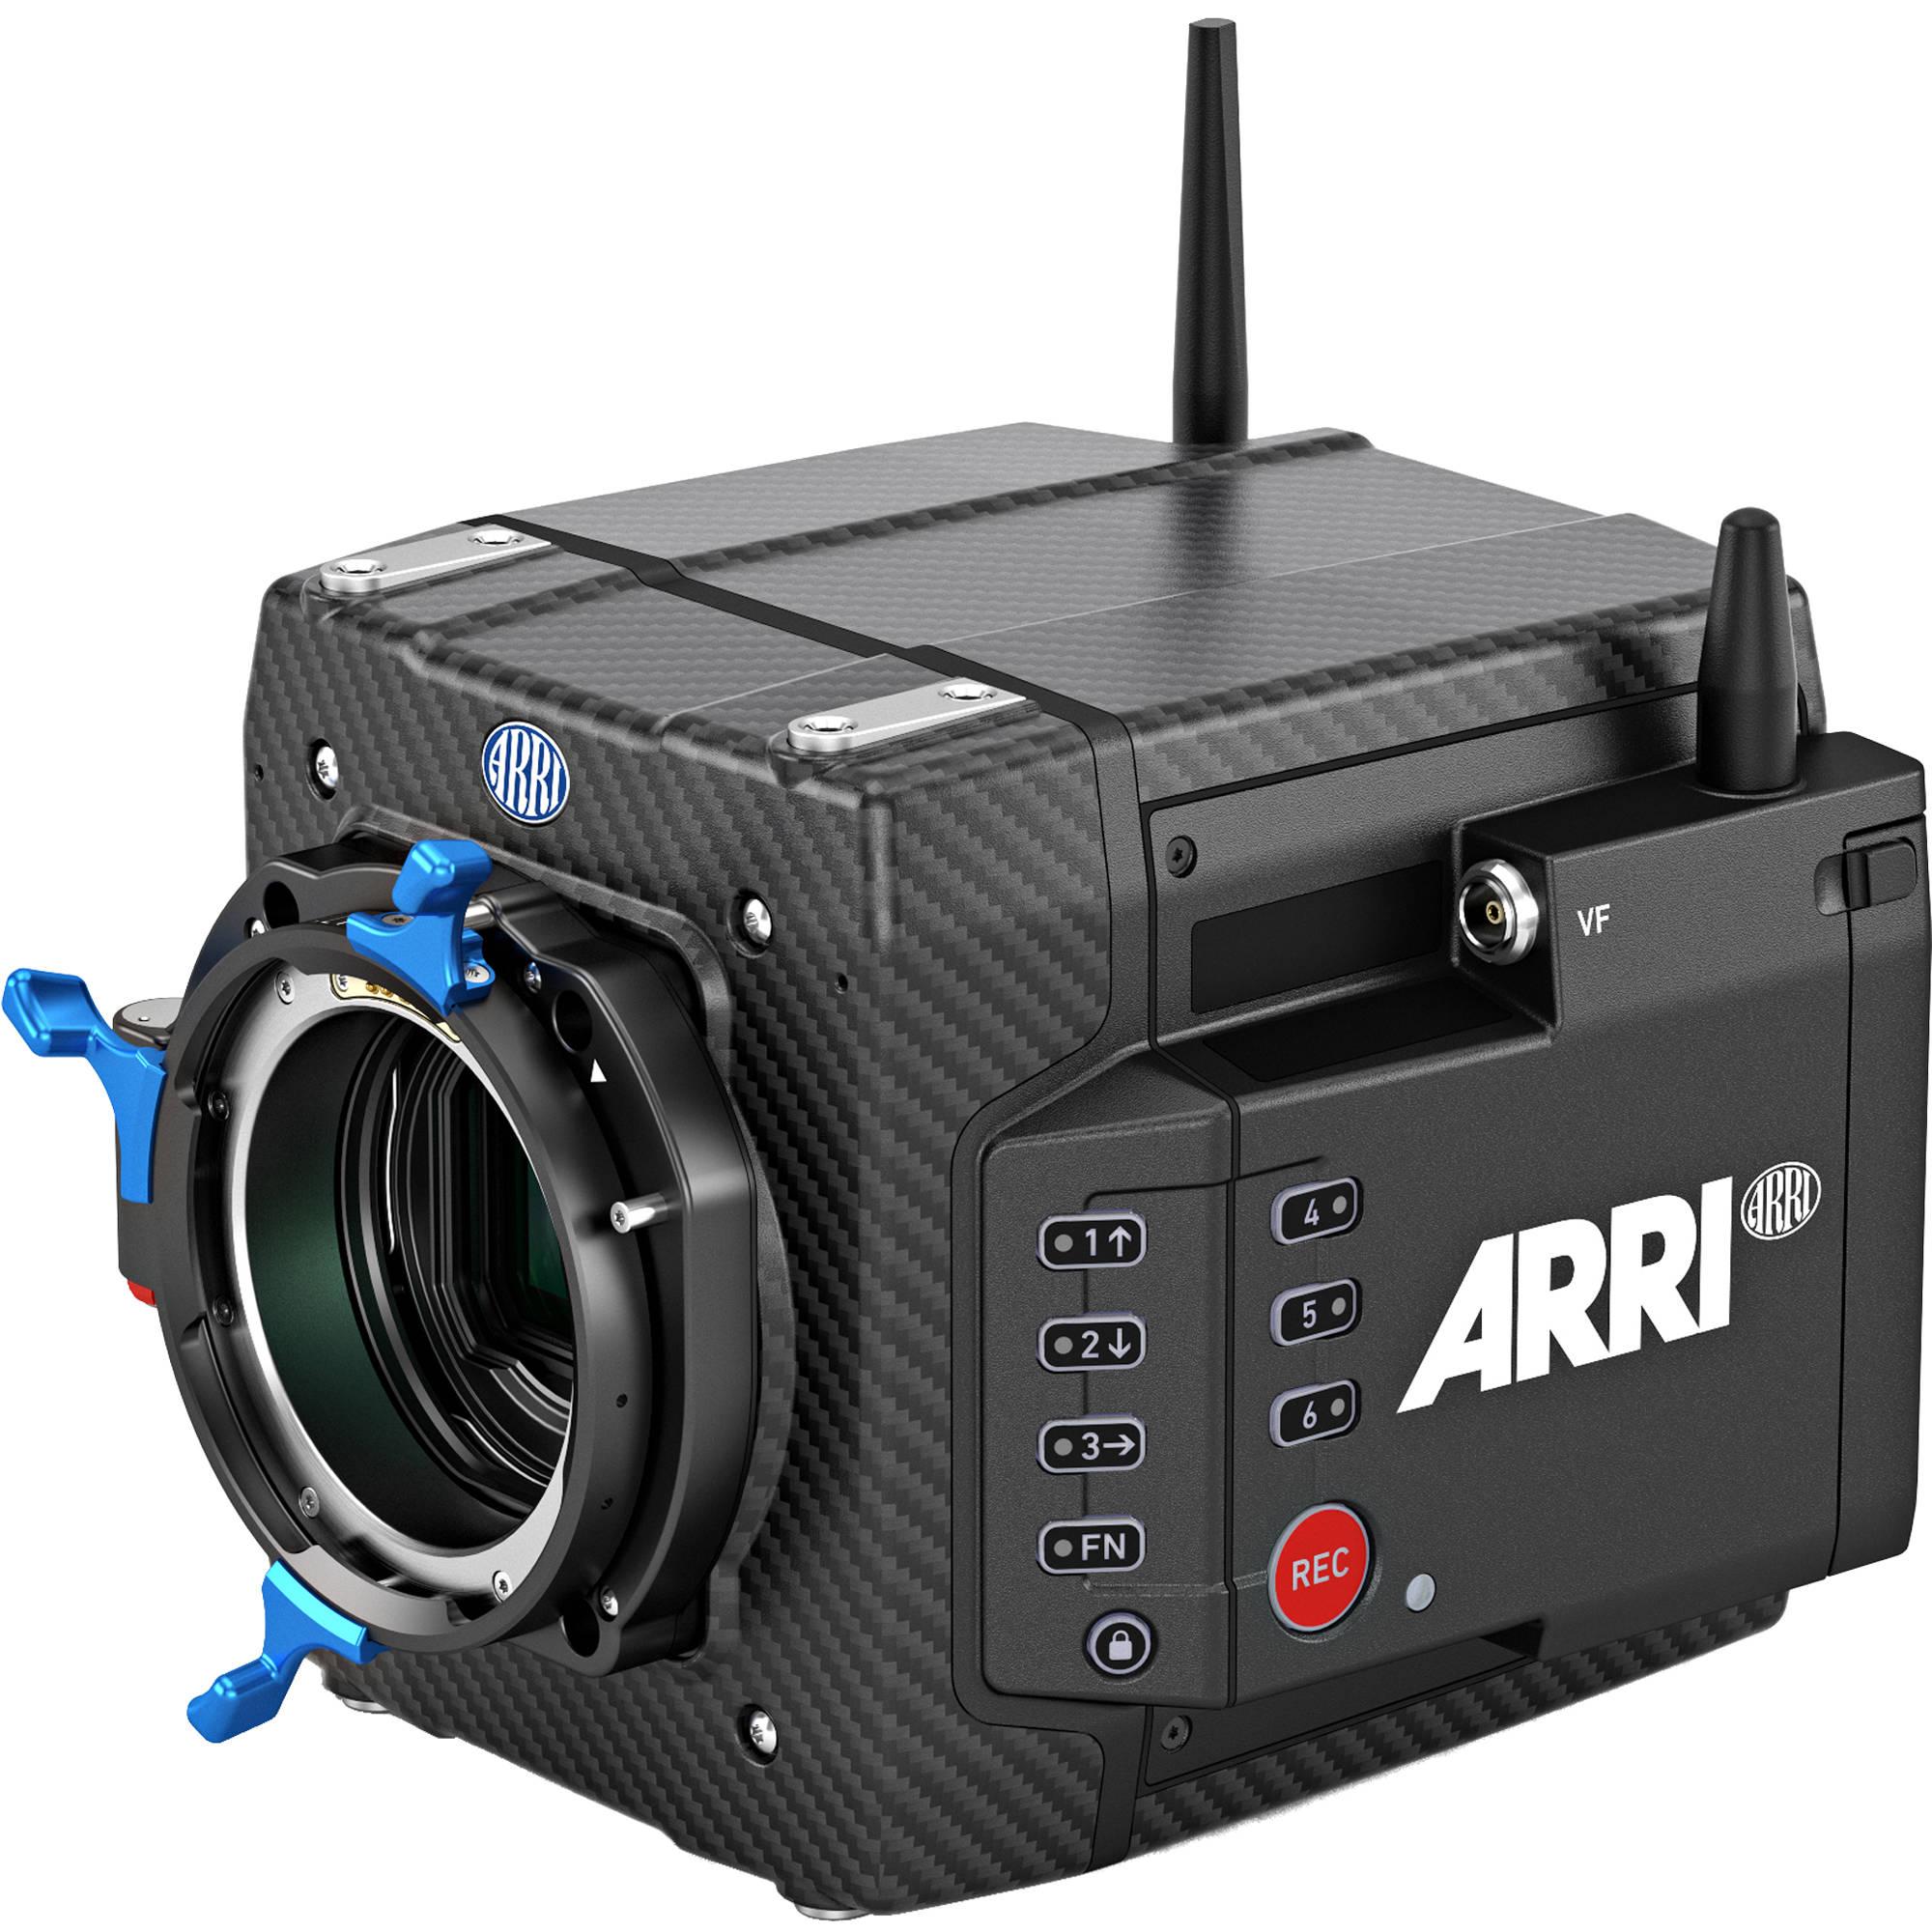 ARRI ALEXA Mini LF and Lens Mount Set (LPL) K0 0024310 B&H Photo